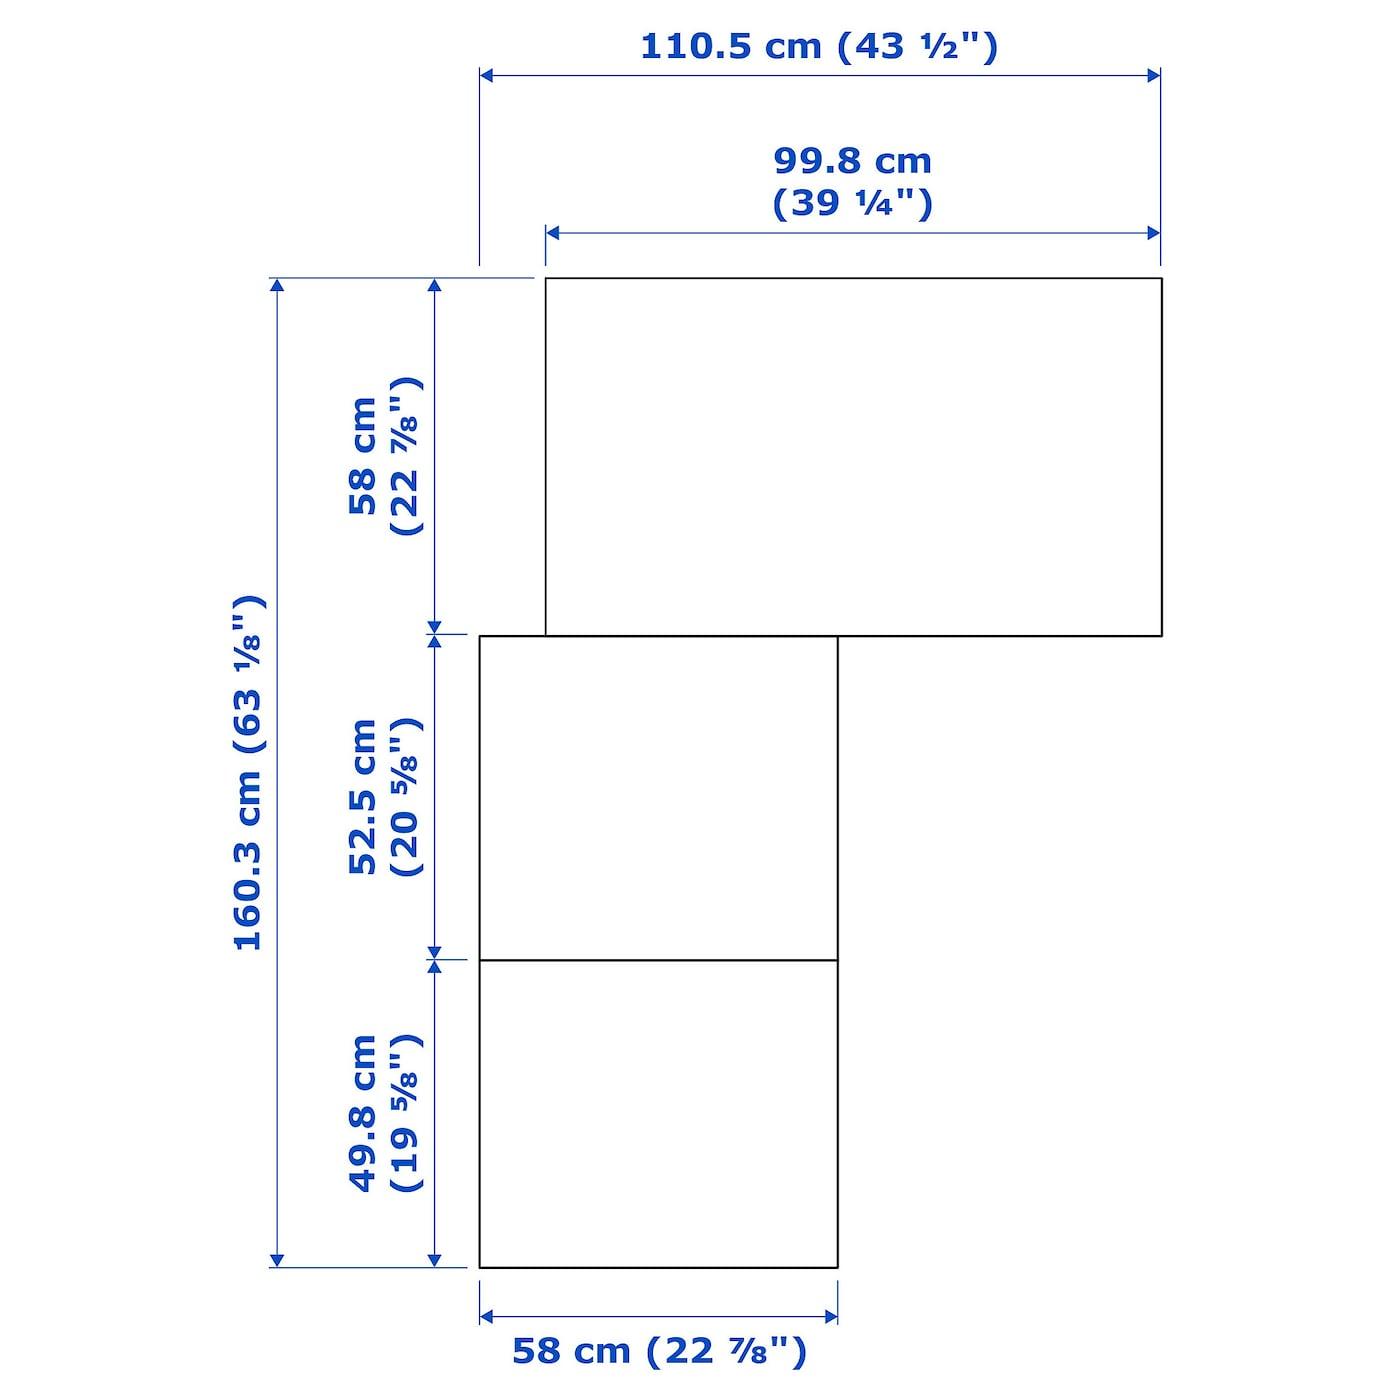 pax penderie d 39 angle blanc forsand marnardal 160 111 x 236 cm ikea. Black Bedroom Furniture Sets. Home Design Ideas